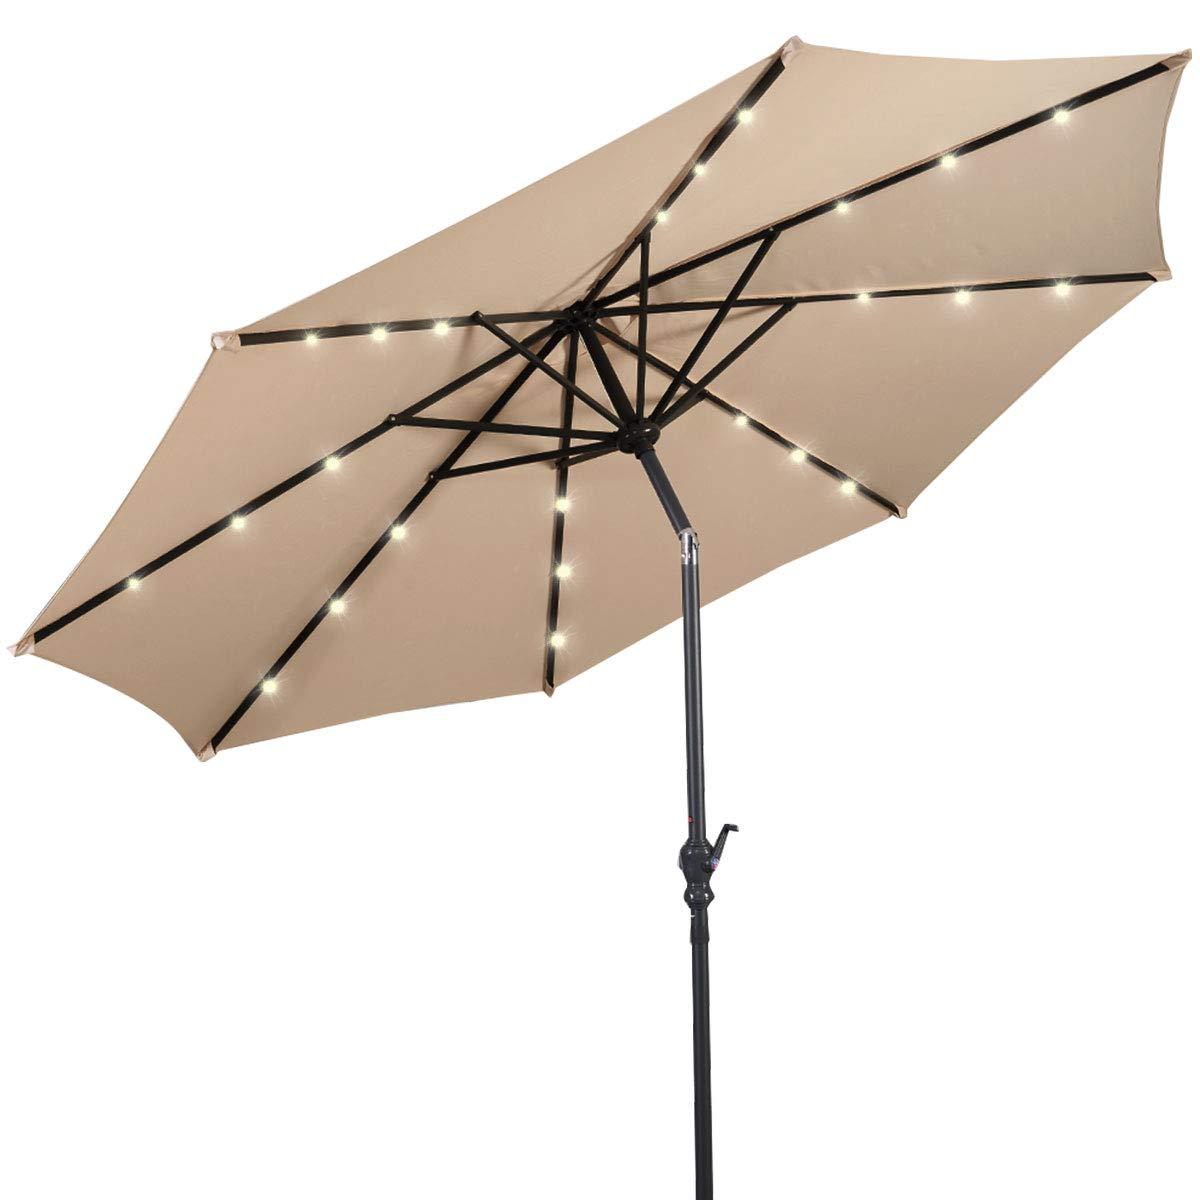 Giantex 10ft Solar Patio Umbrella Sunbrella with Lights, 8 Ribs Market Steel Tilt w/Crank for Garden, Deck, Backyard, Pool Indoor Outdoor Use by Giantex